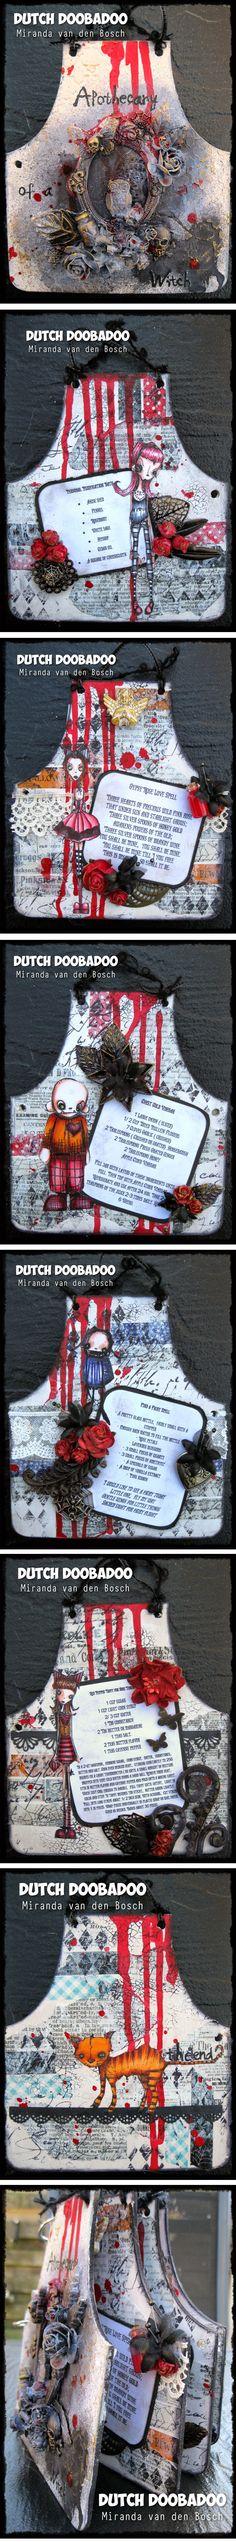 Artwork created by Miranda Van Den Bosch using rubber stamps designed by Daniel Torrente for Stampotique Originals